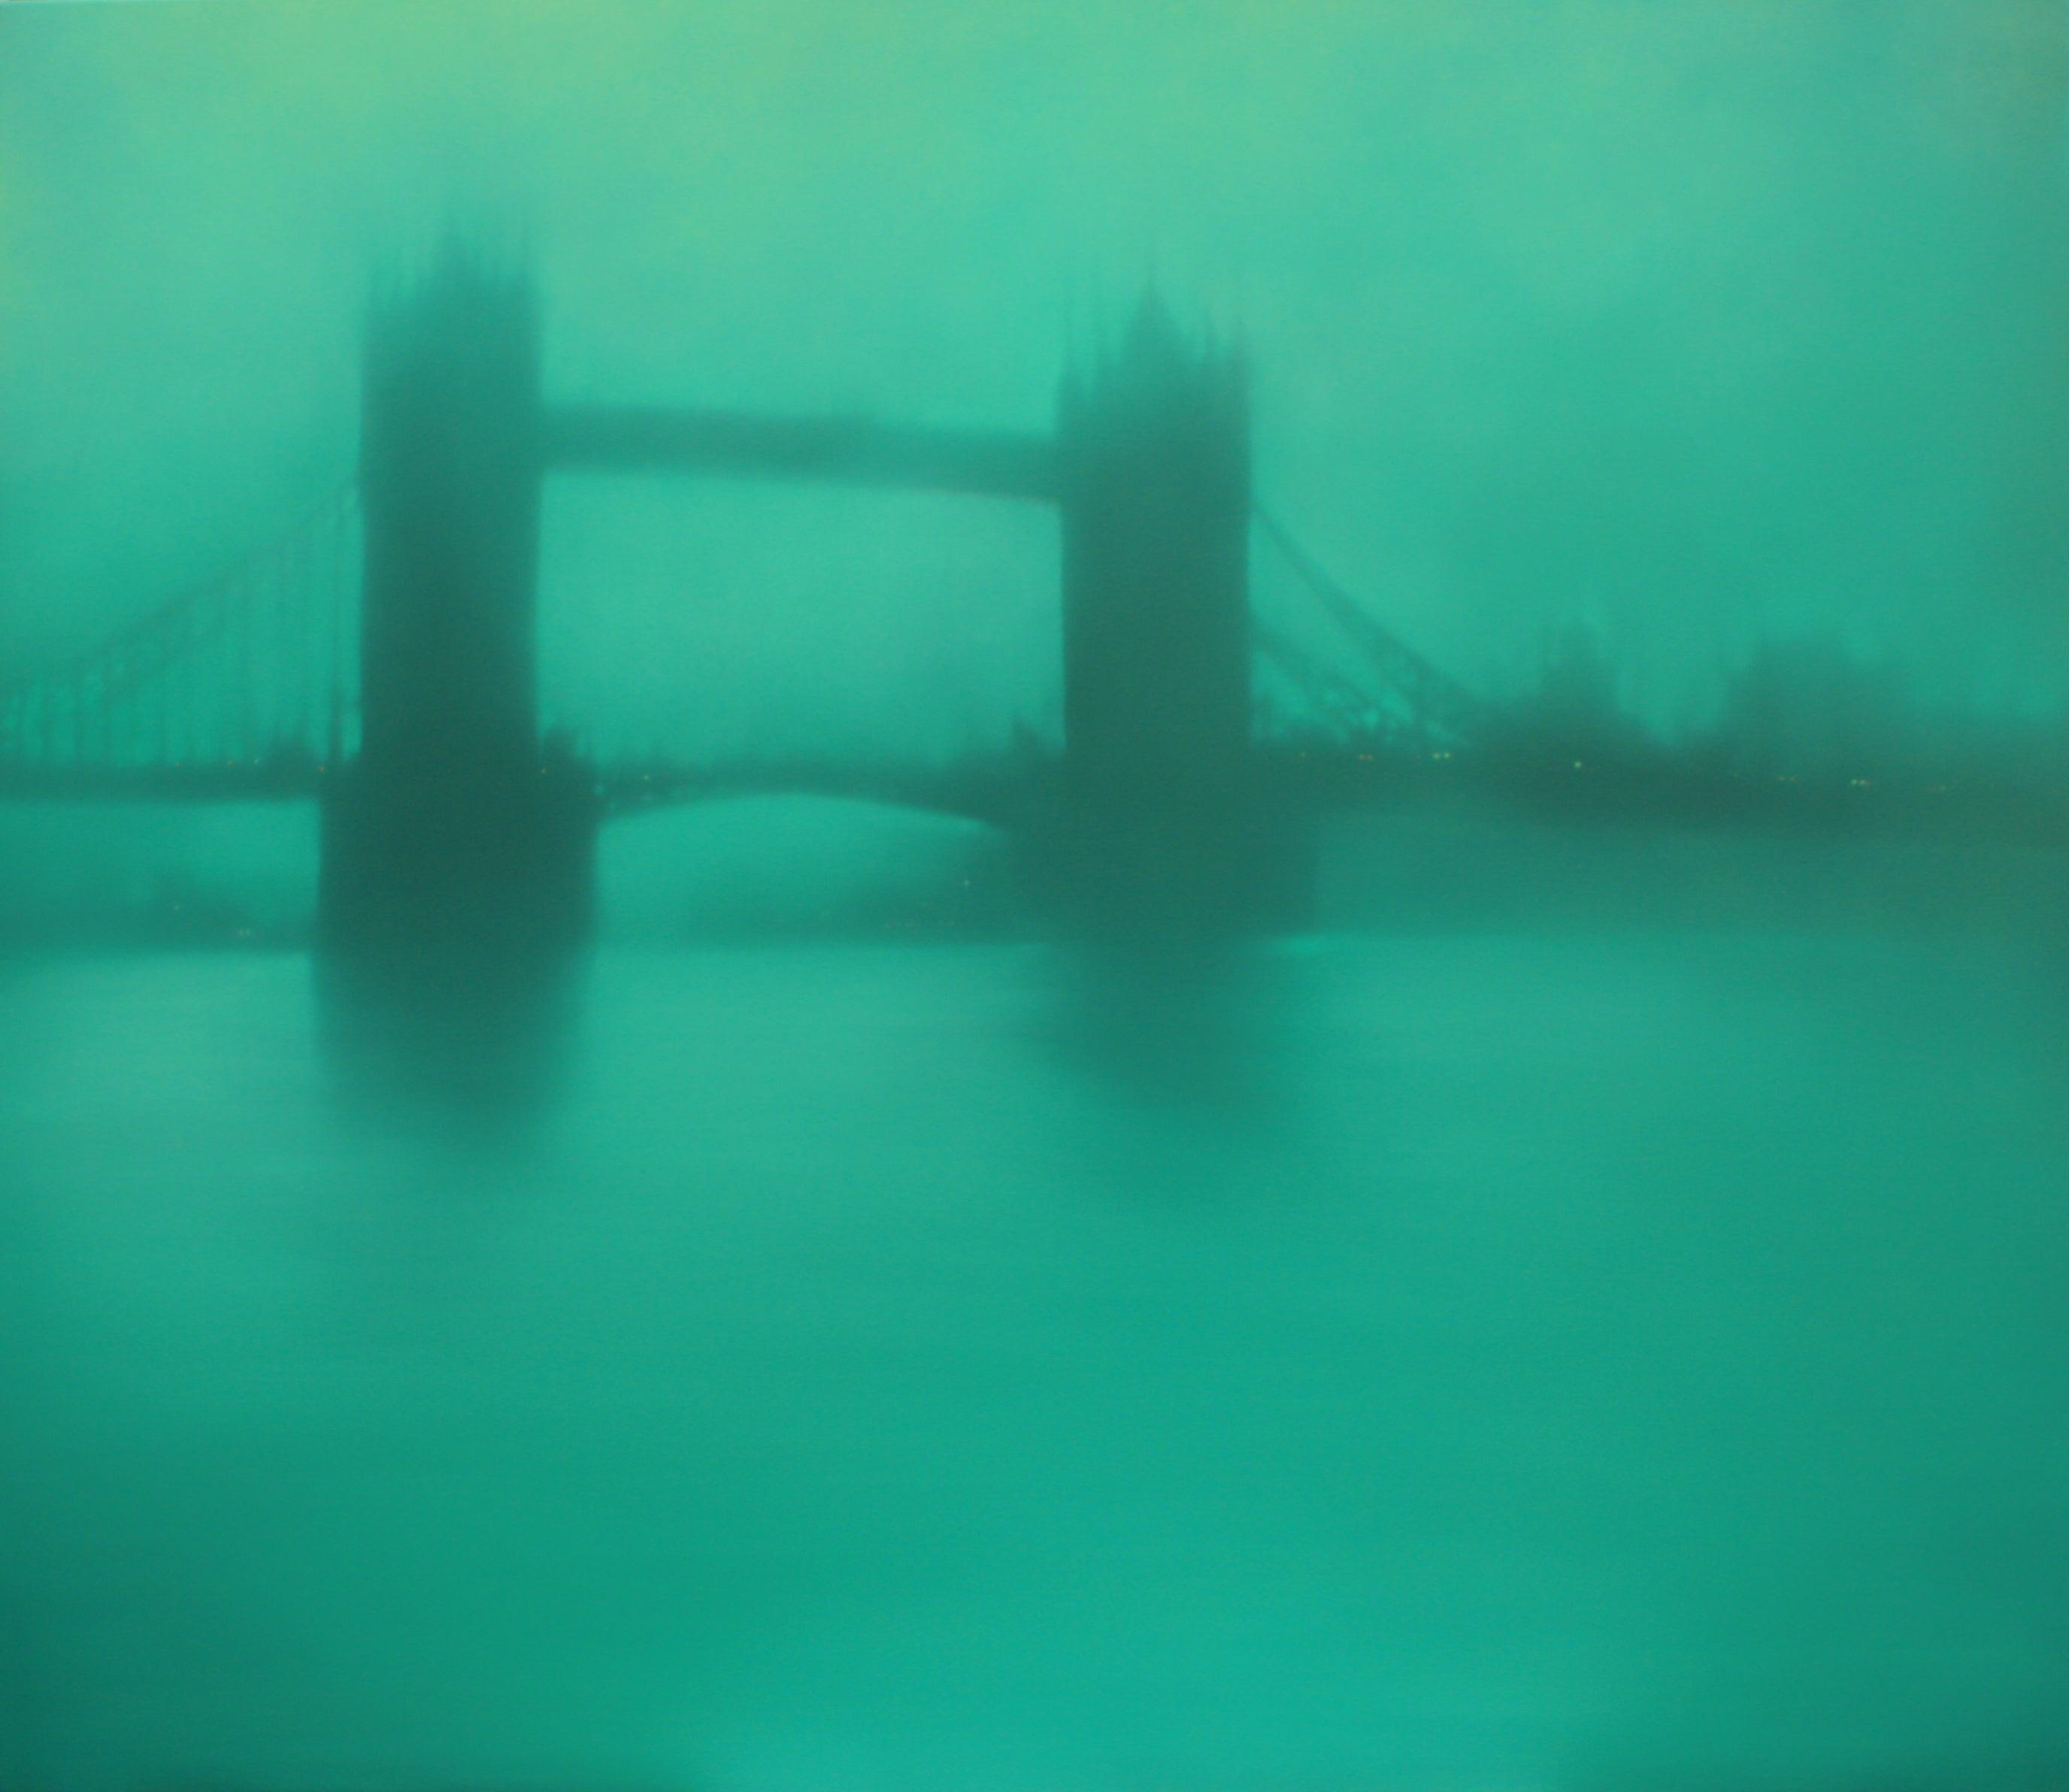 Turquoise Tower Bridge (London) Jenny Pockley Original cityscape oil painting.